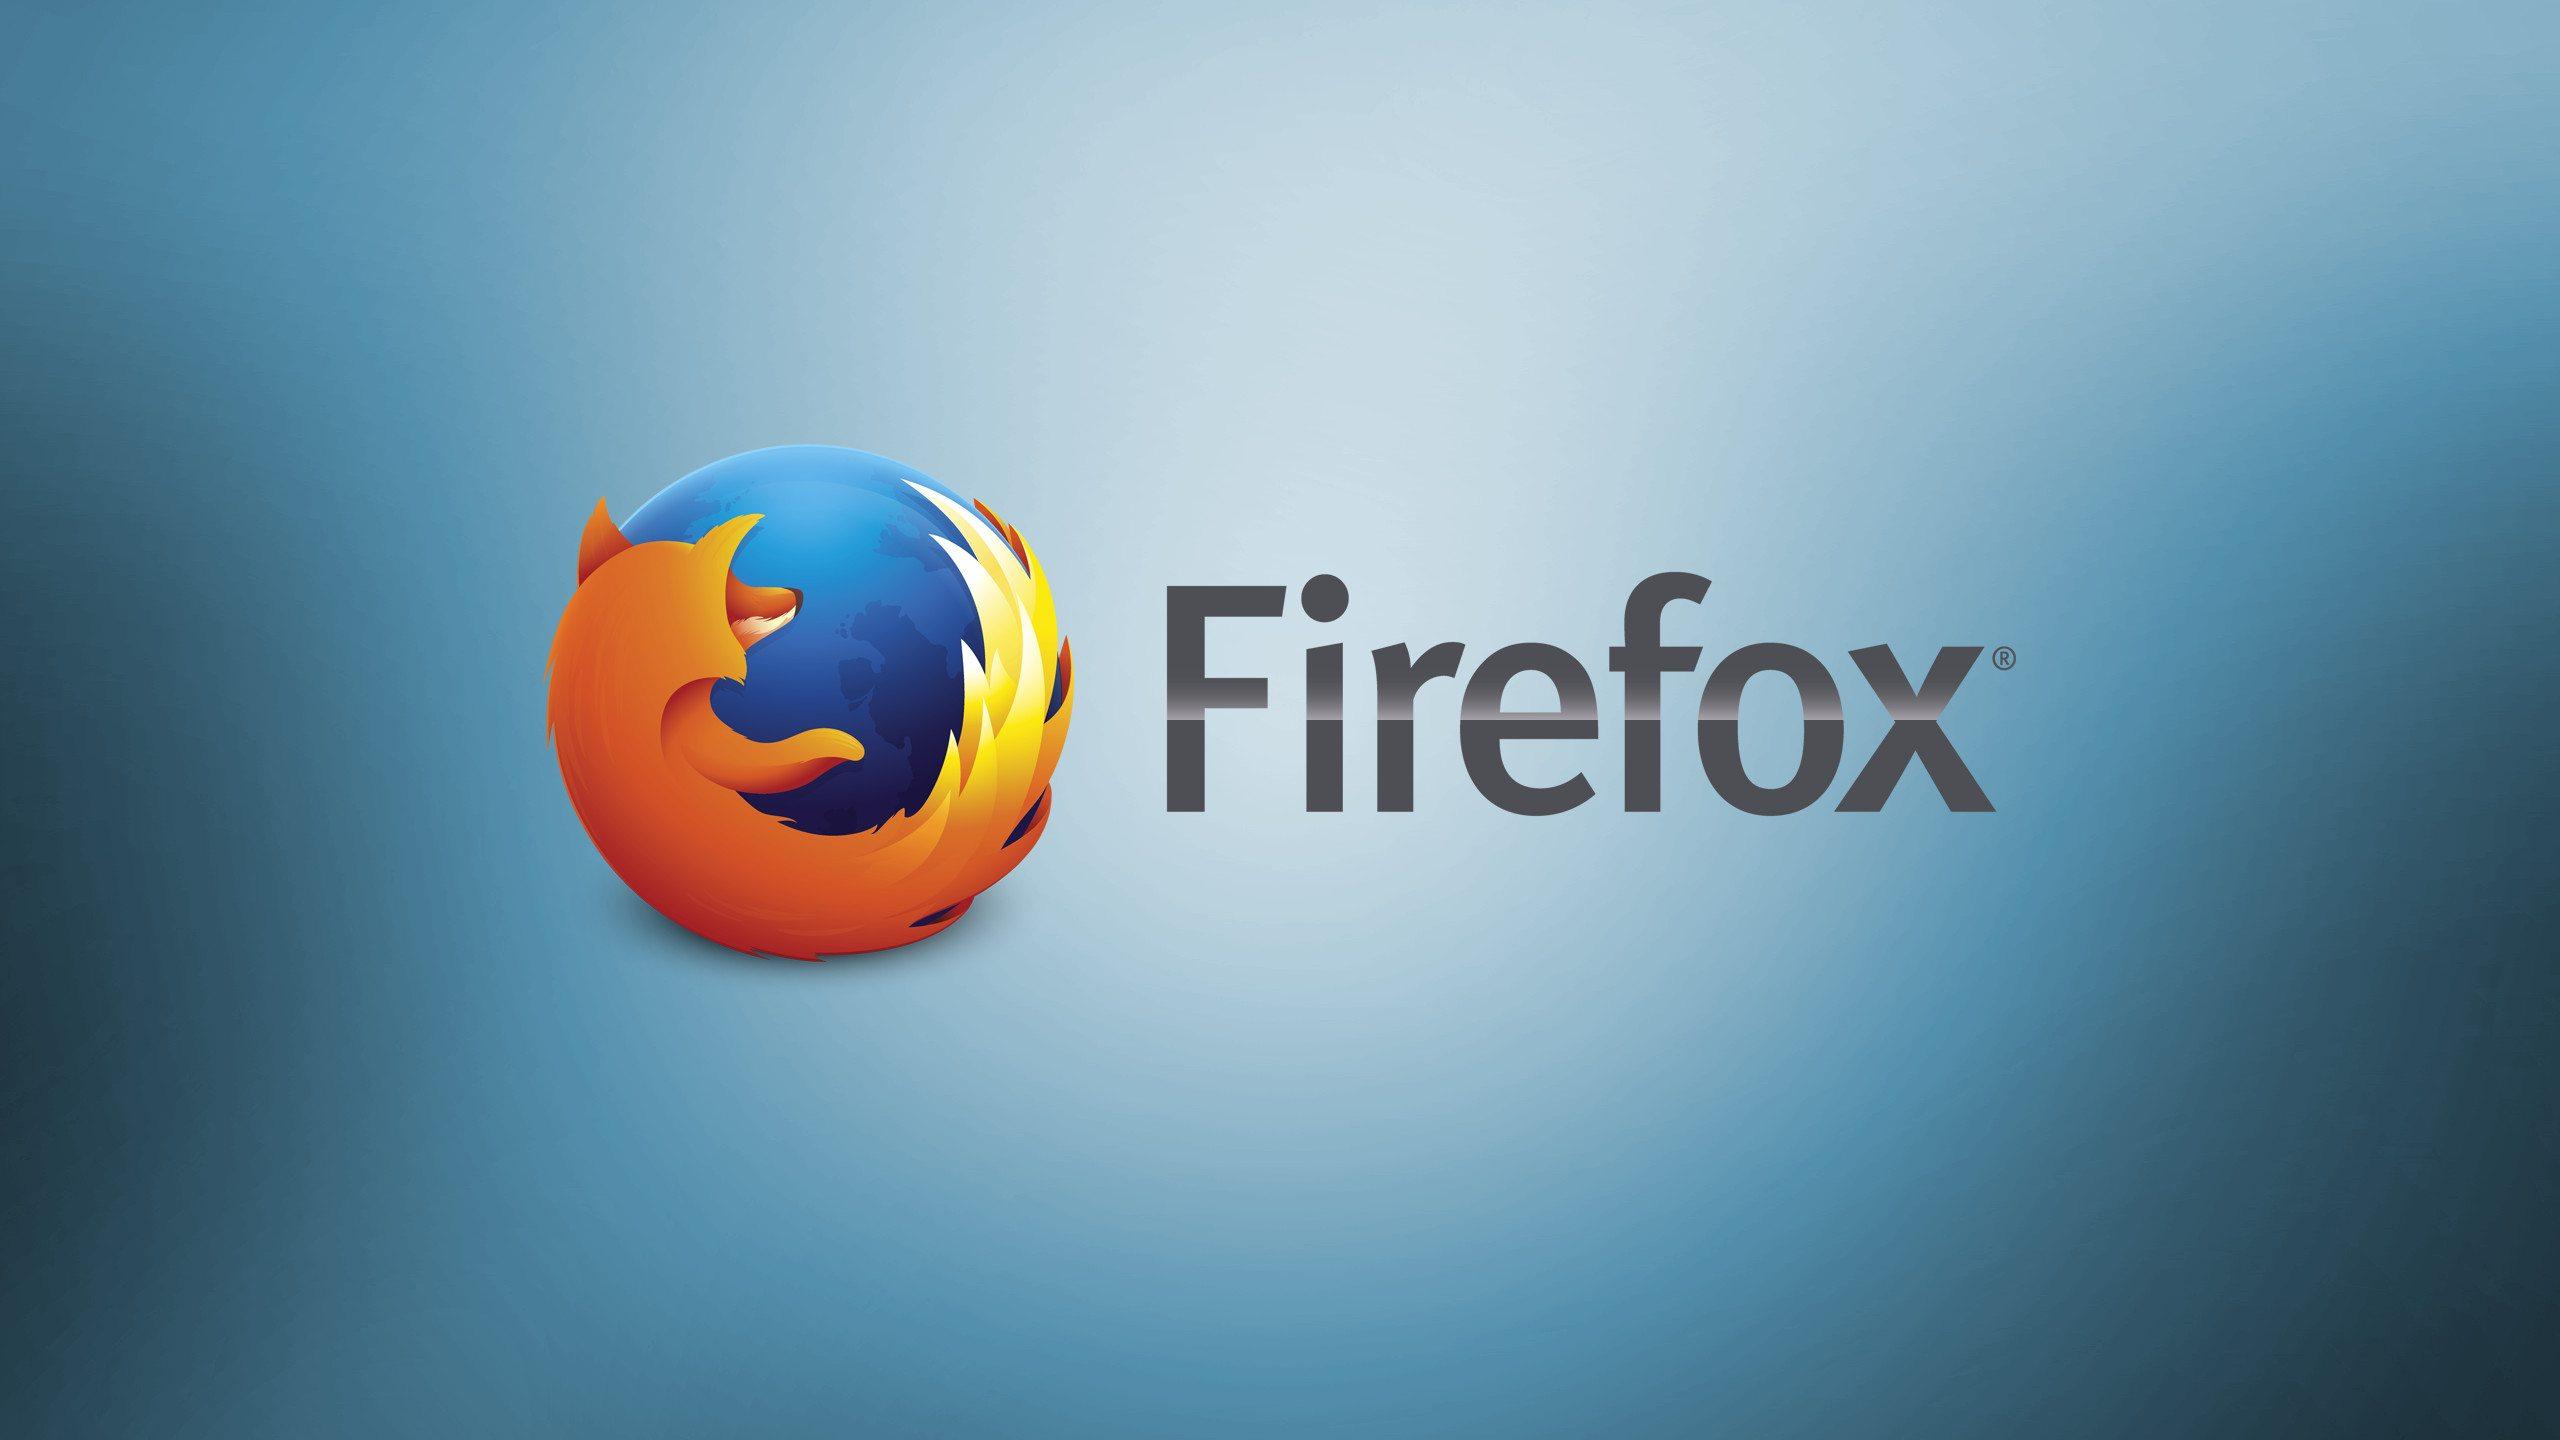 Интересные факты о браузере Firefox